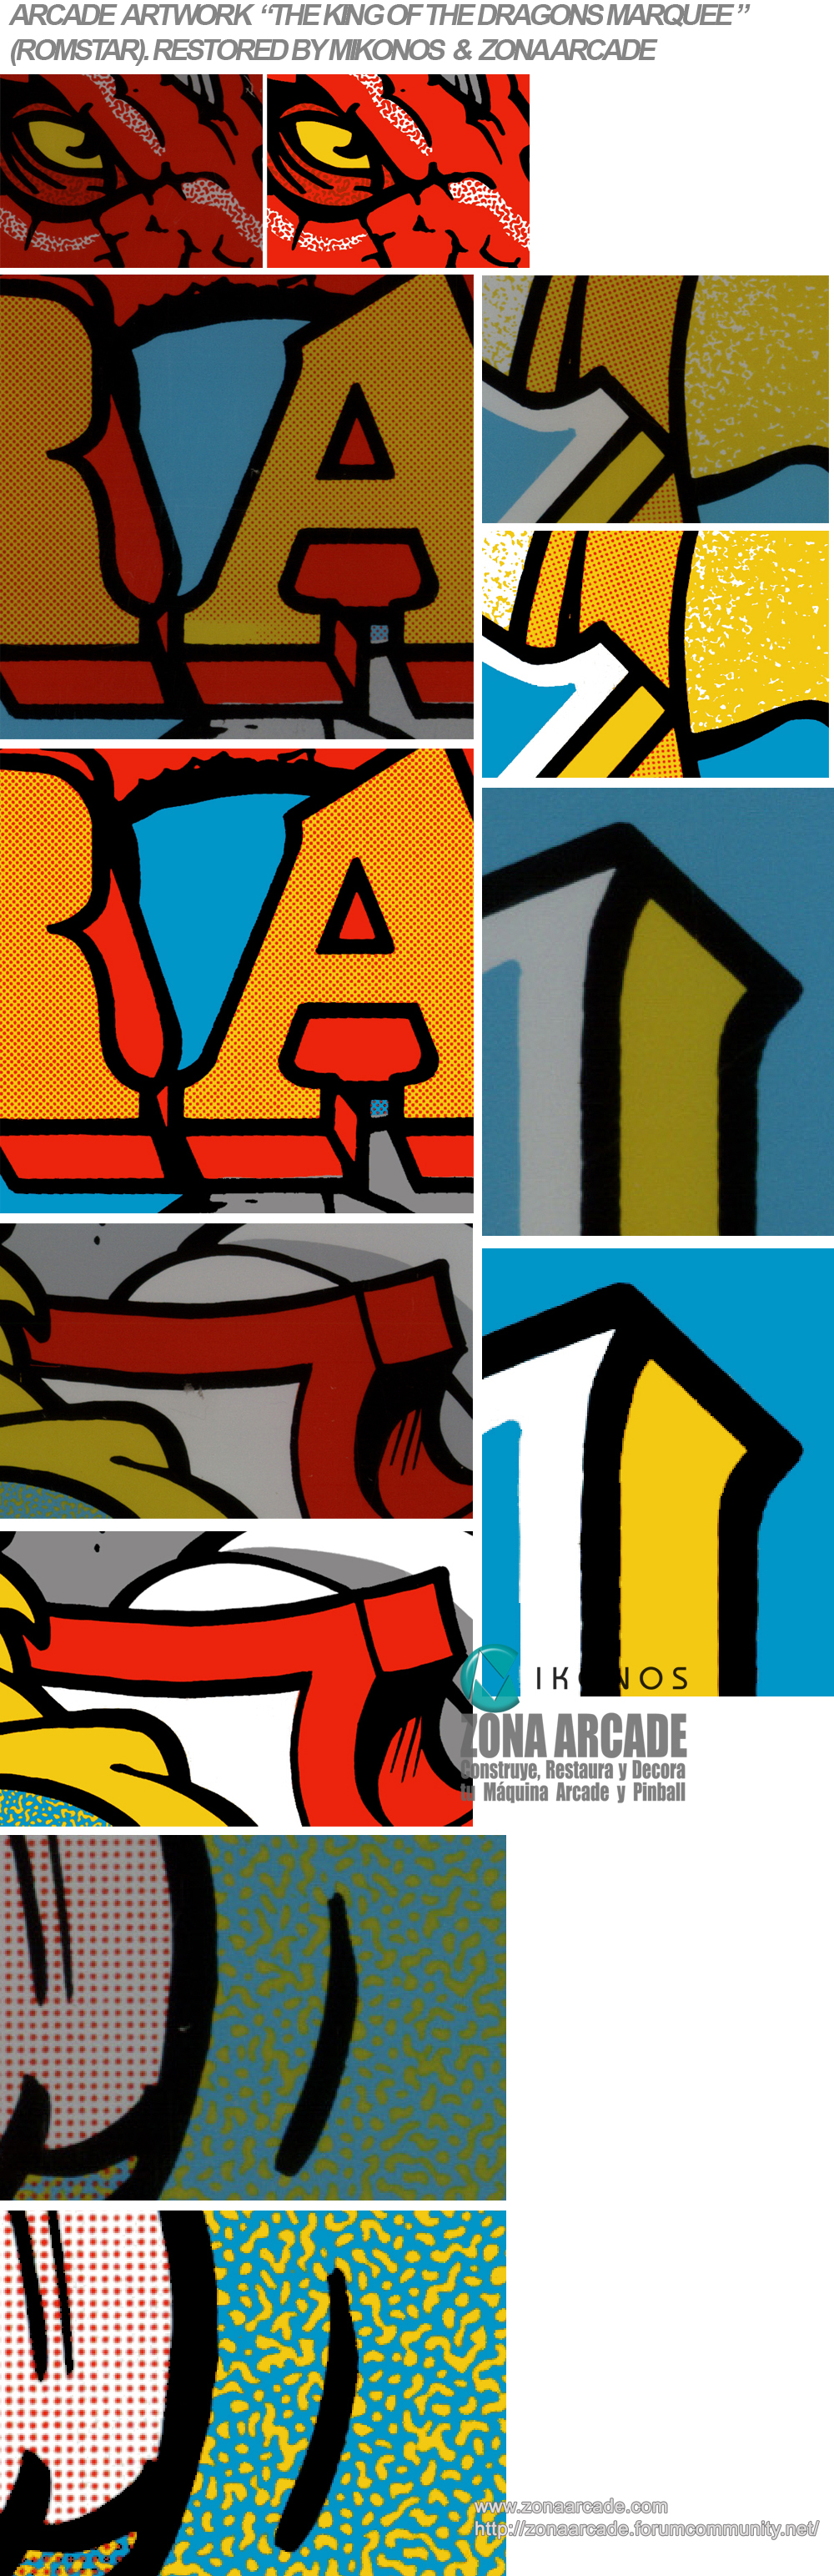 MY CLASSIC ARCADE ARTWORKS RESTORED • MAACA org